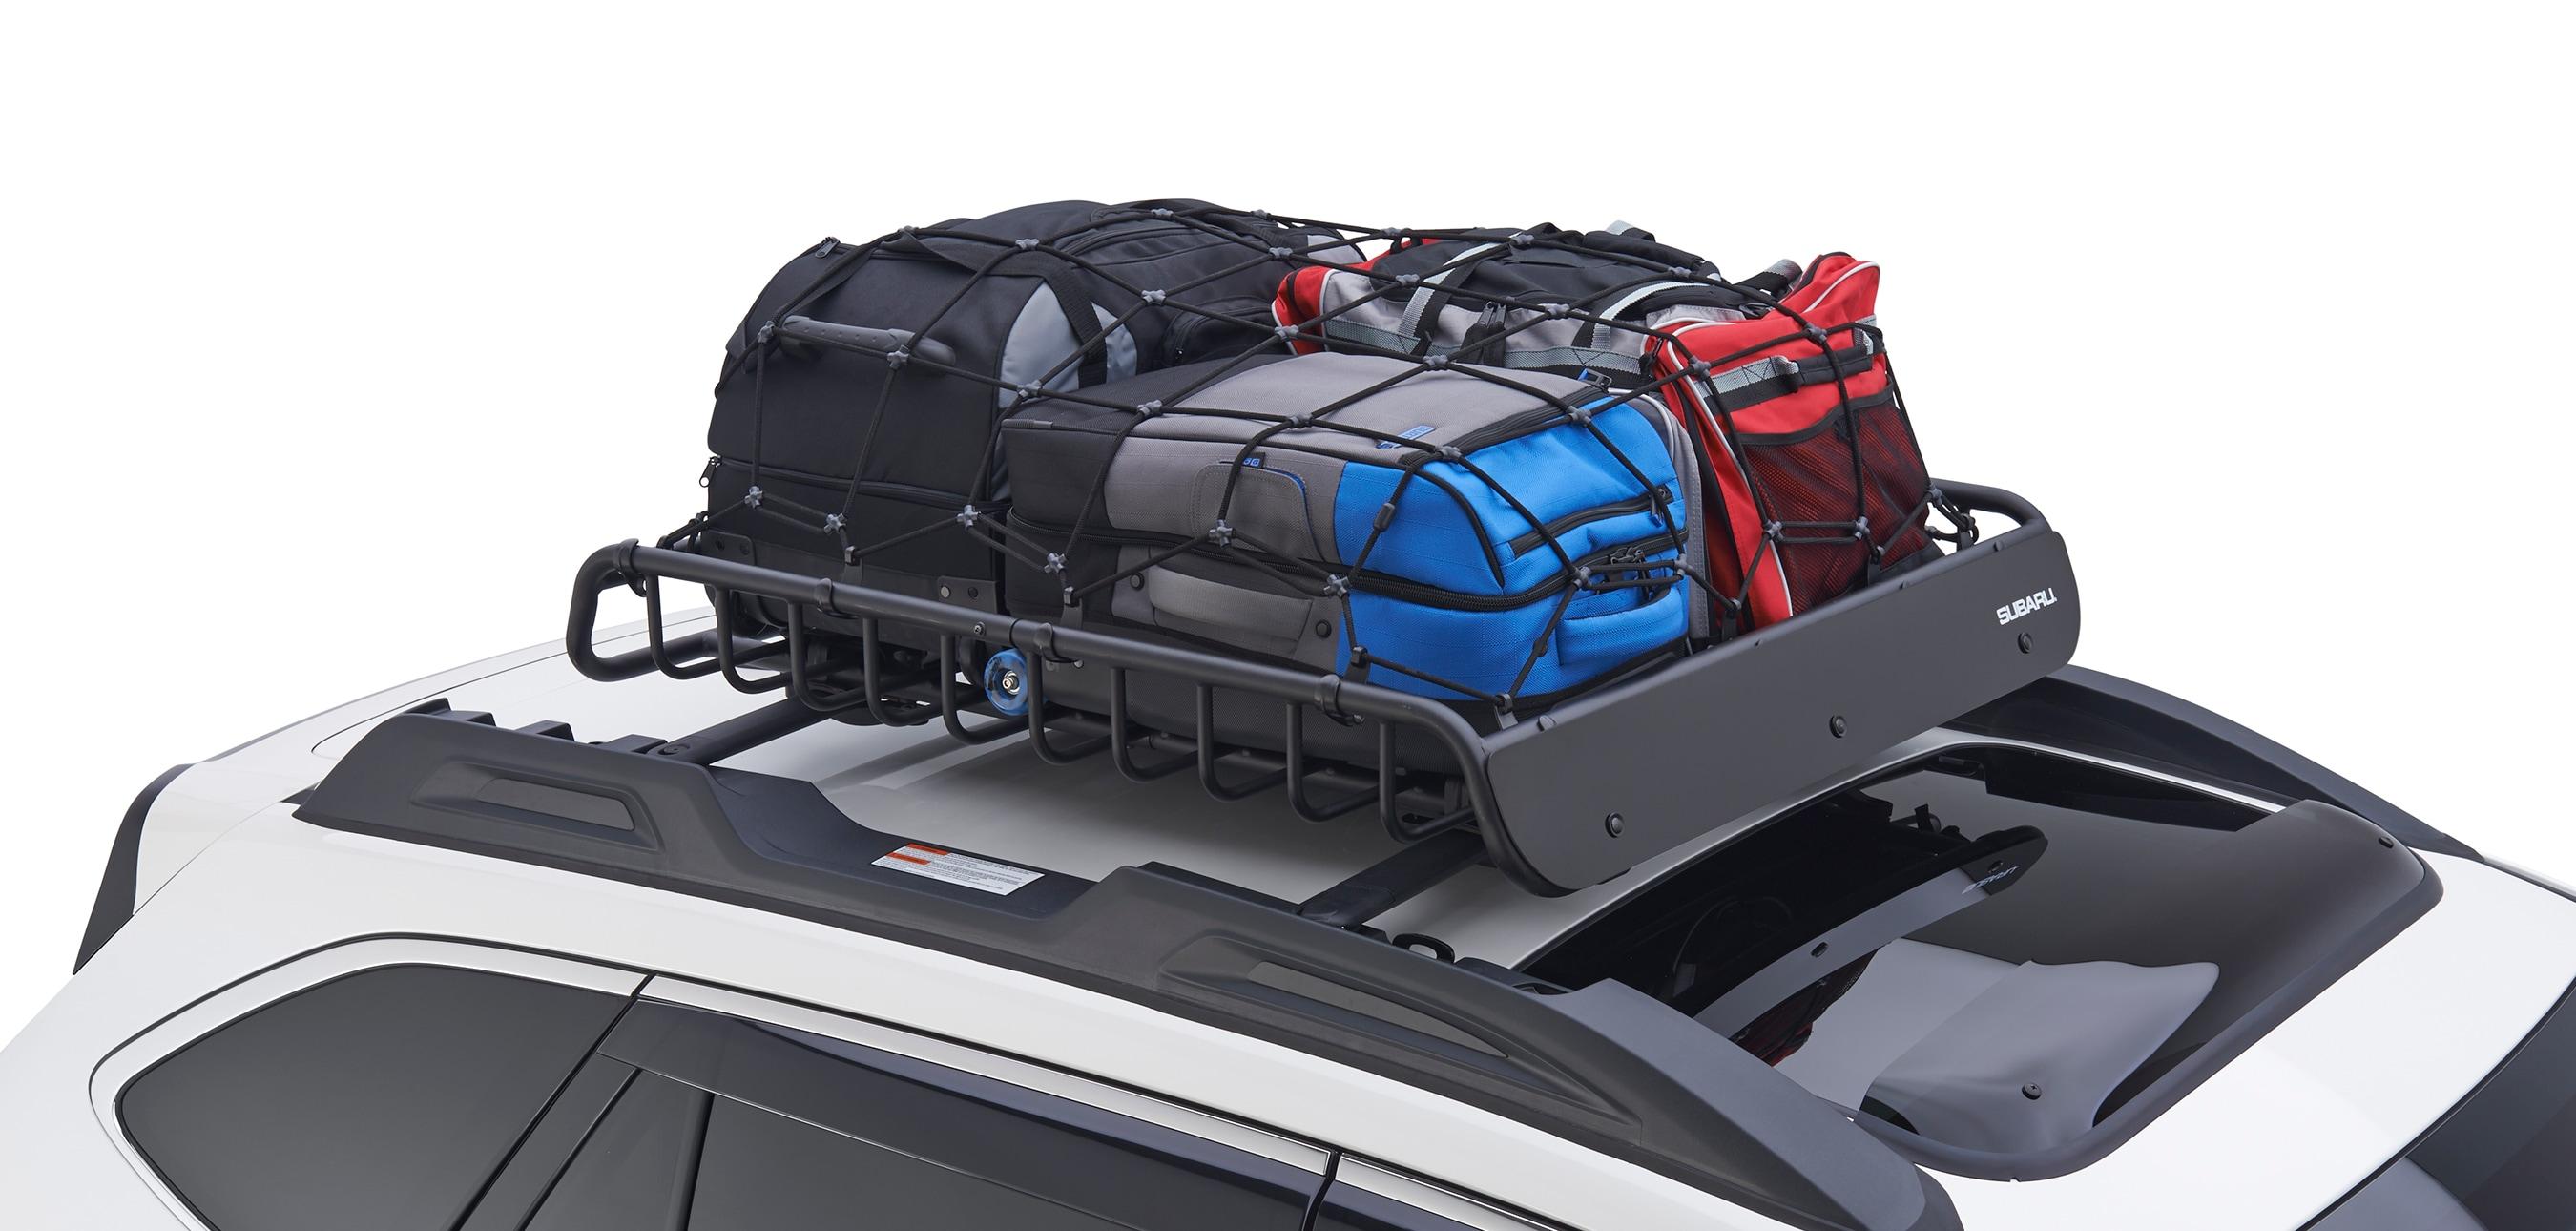 Order A Subaru Roof Cargo Basket At Seller Subaru